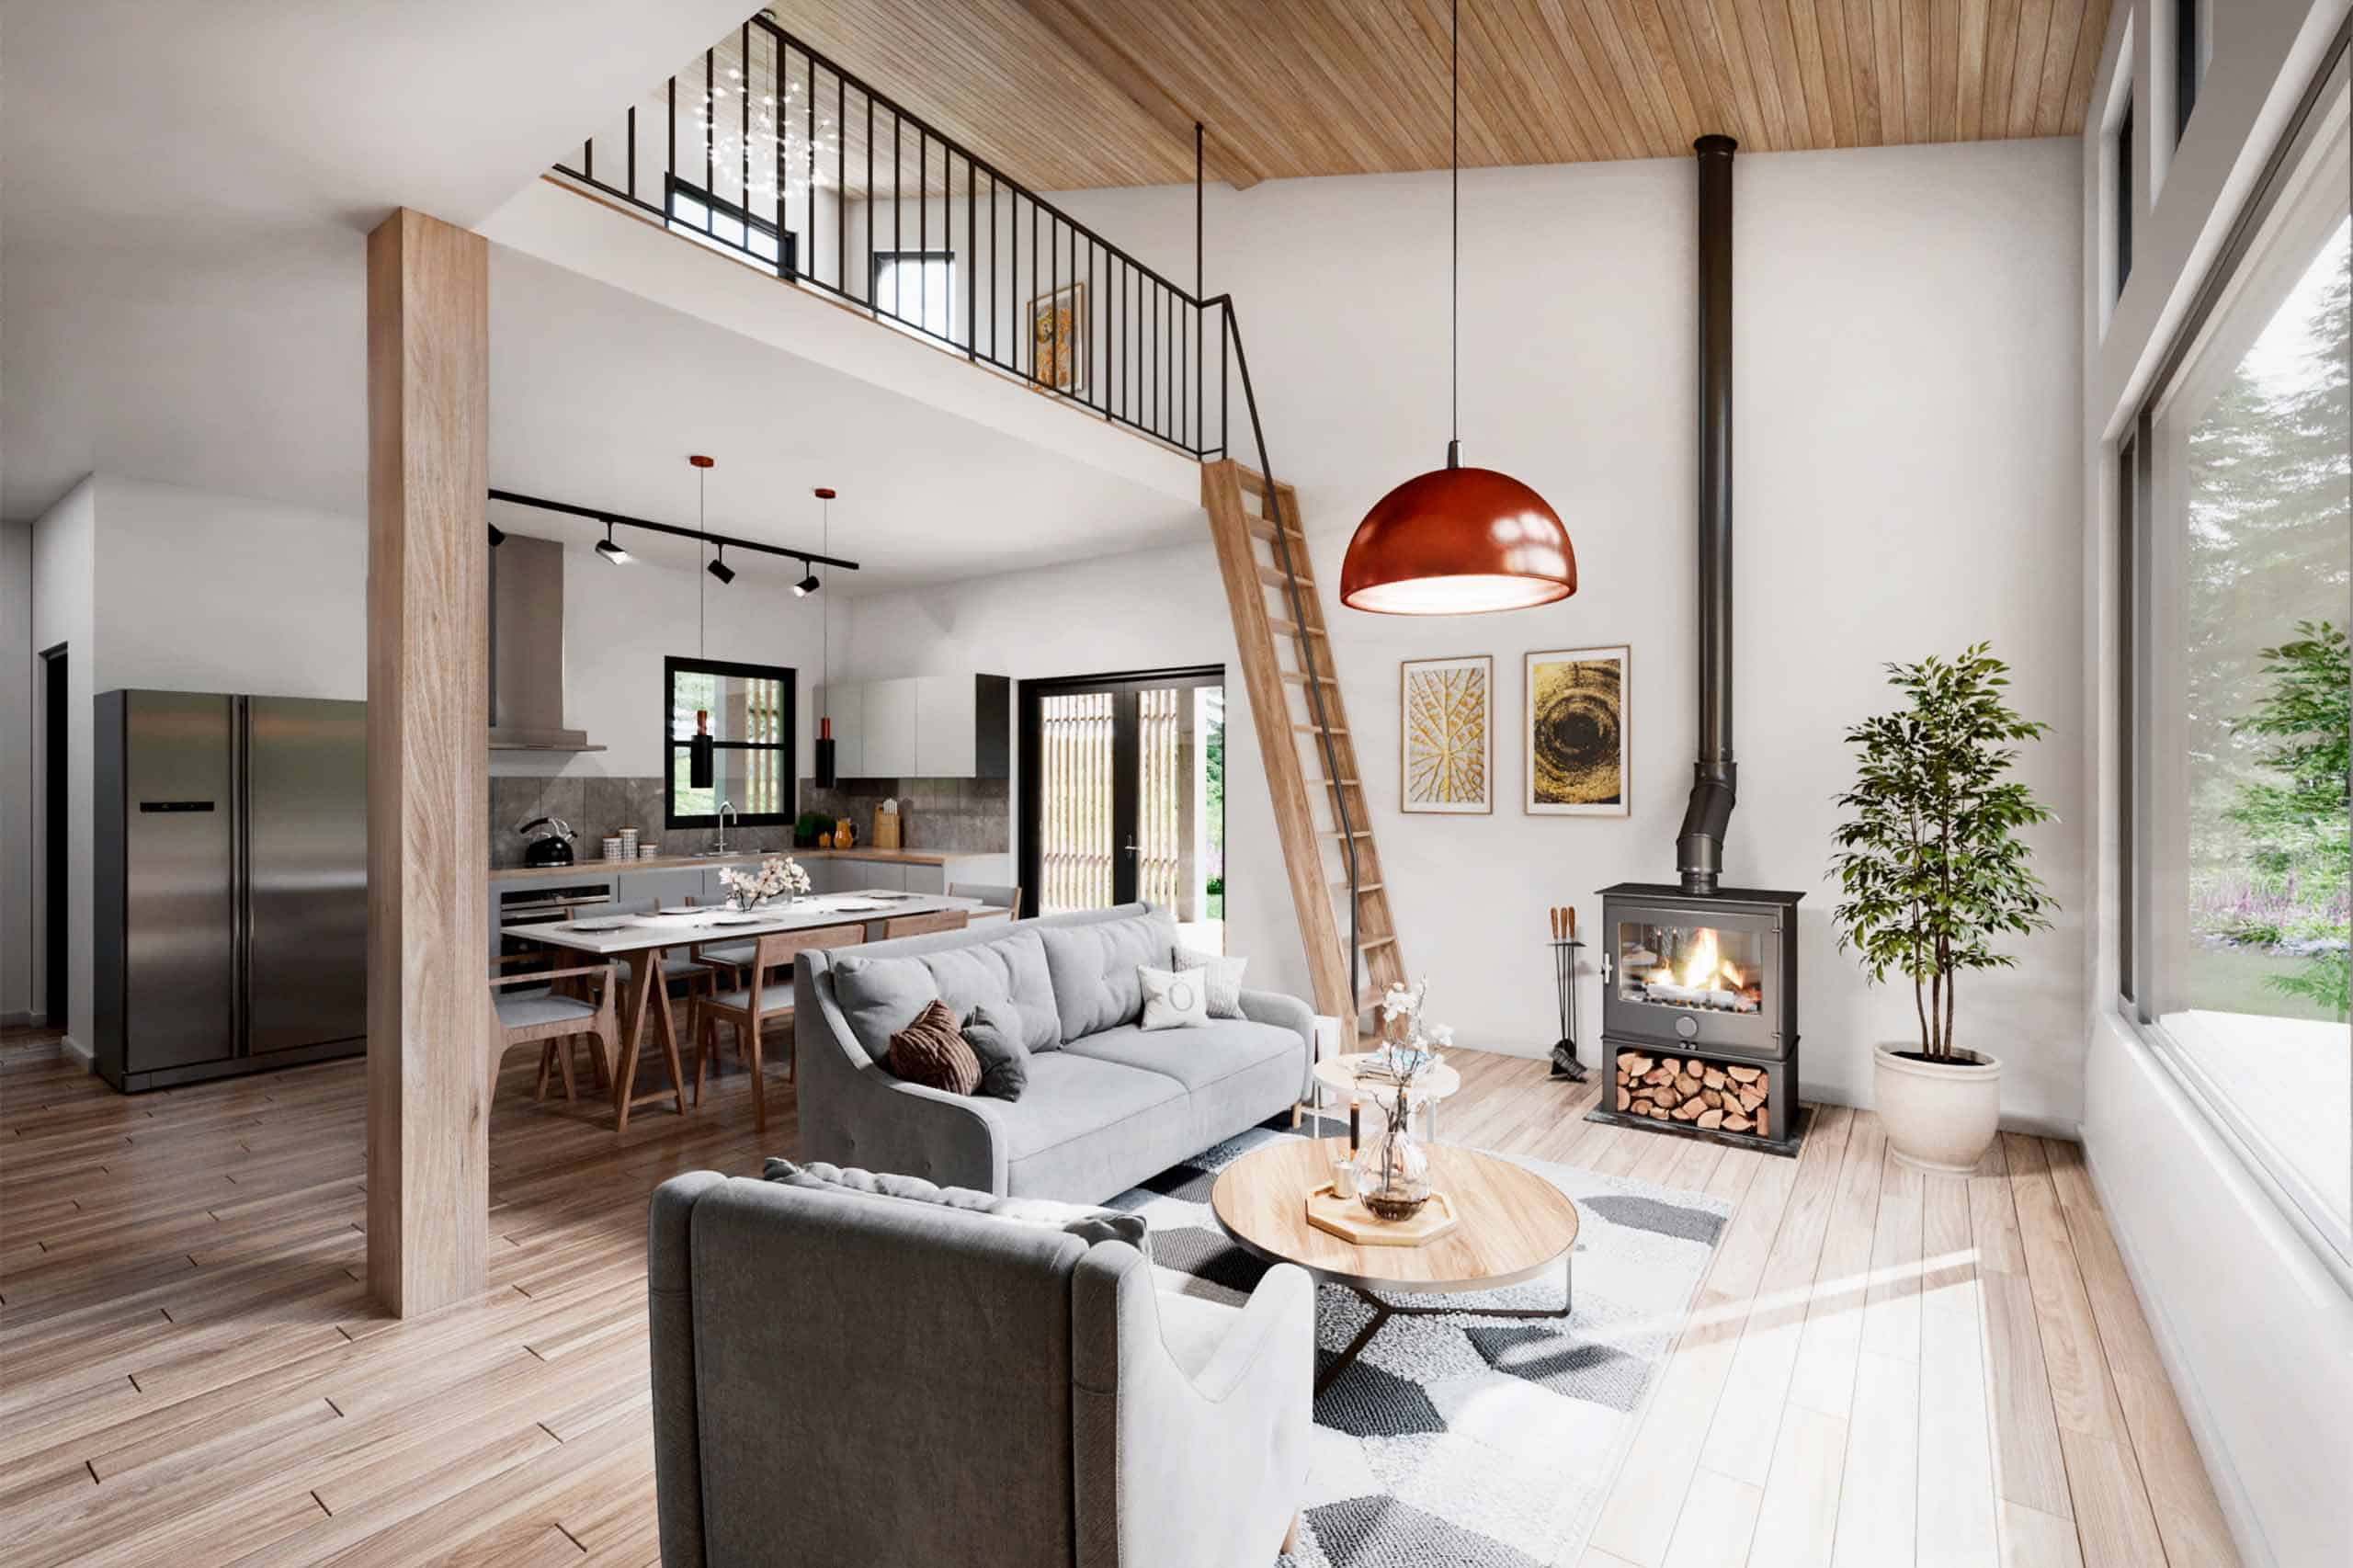 Truoba 321 2 bedroom house plans living area